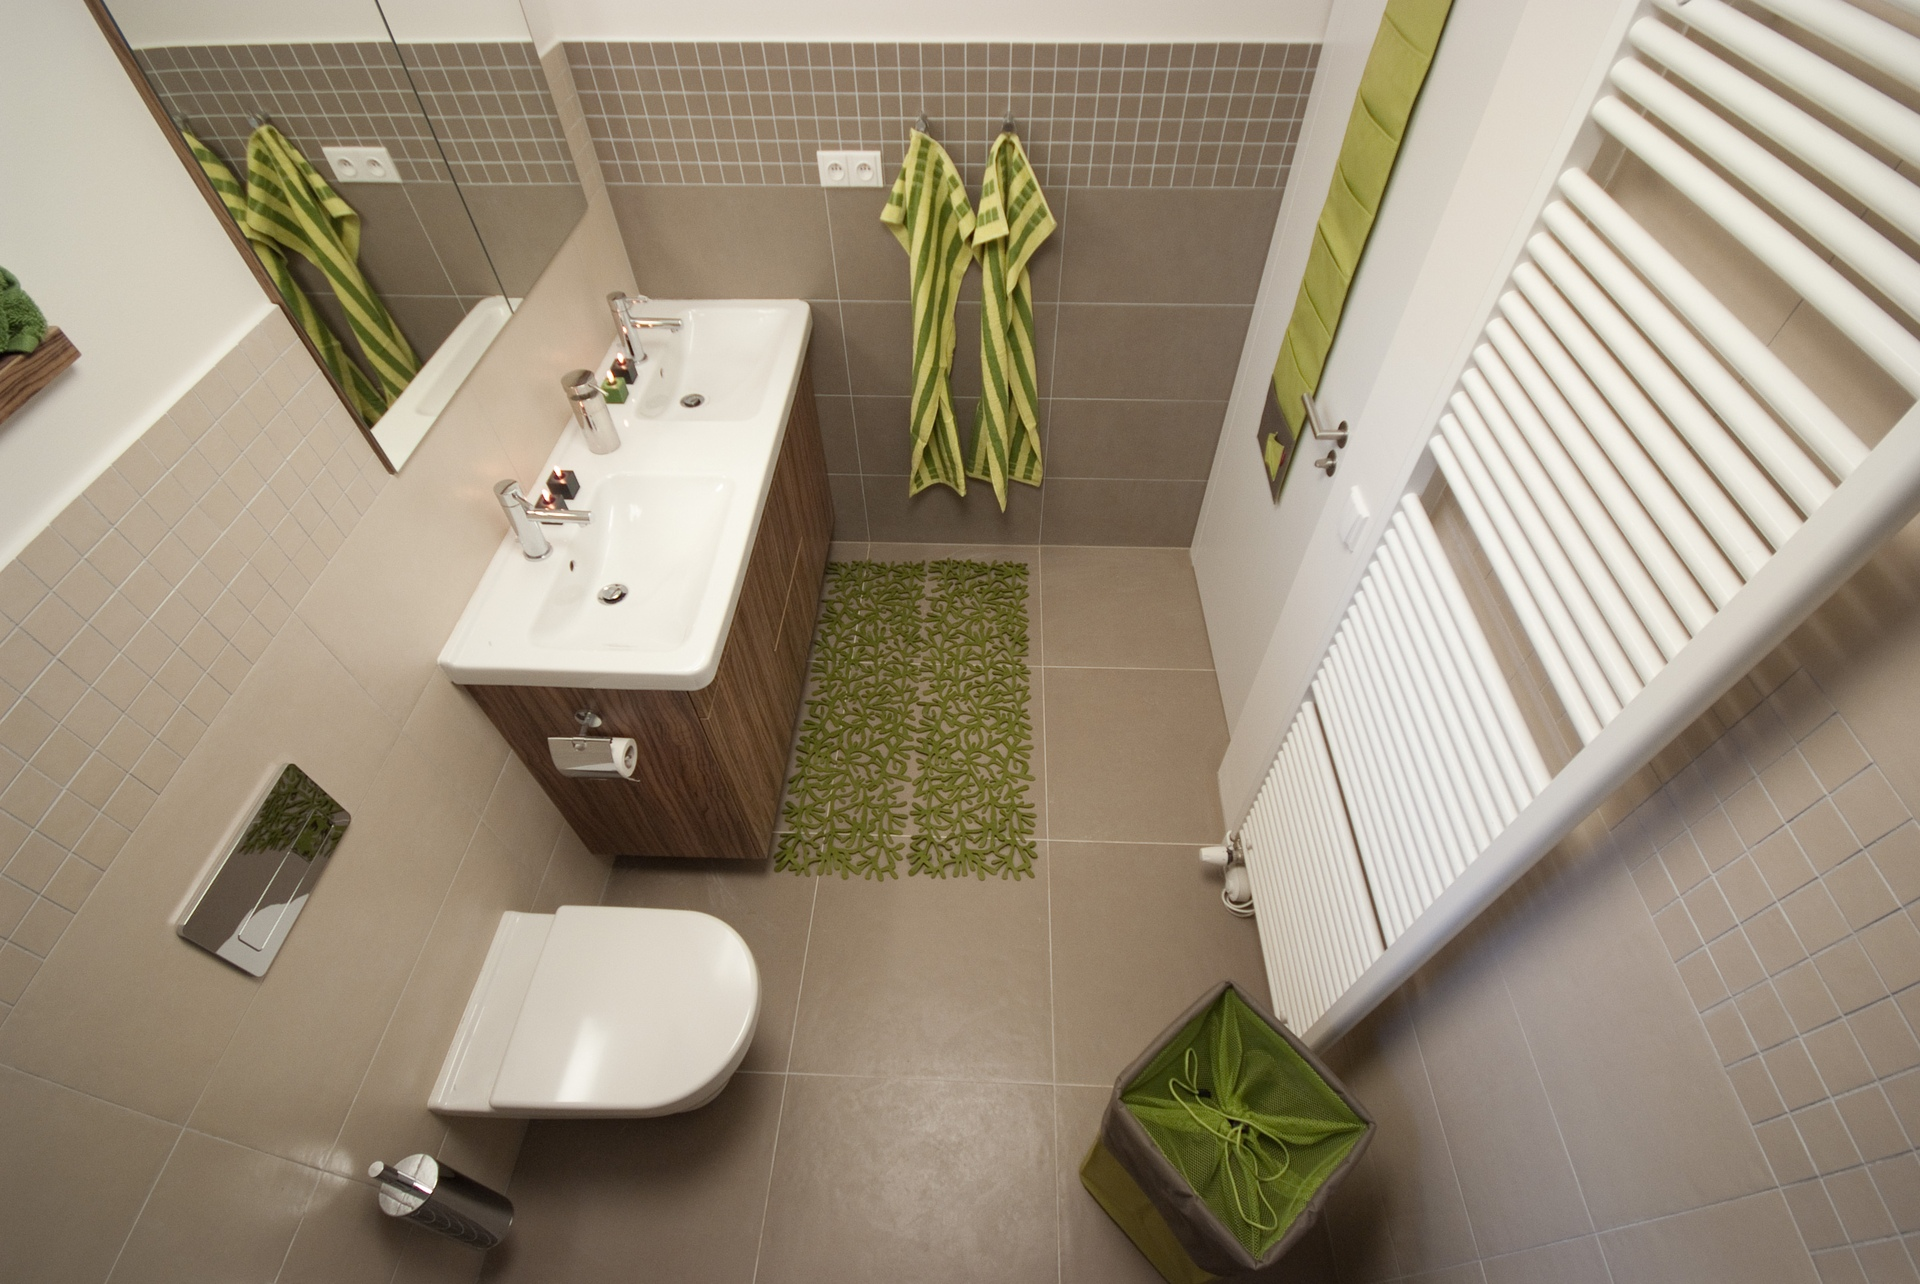 jak se staví sen - koupelna Beroun 4